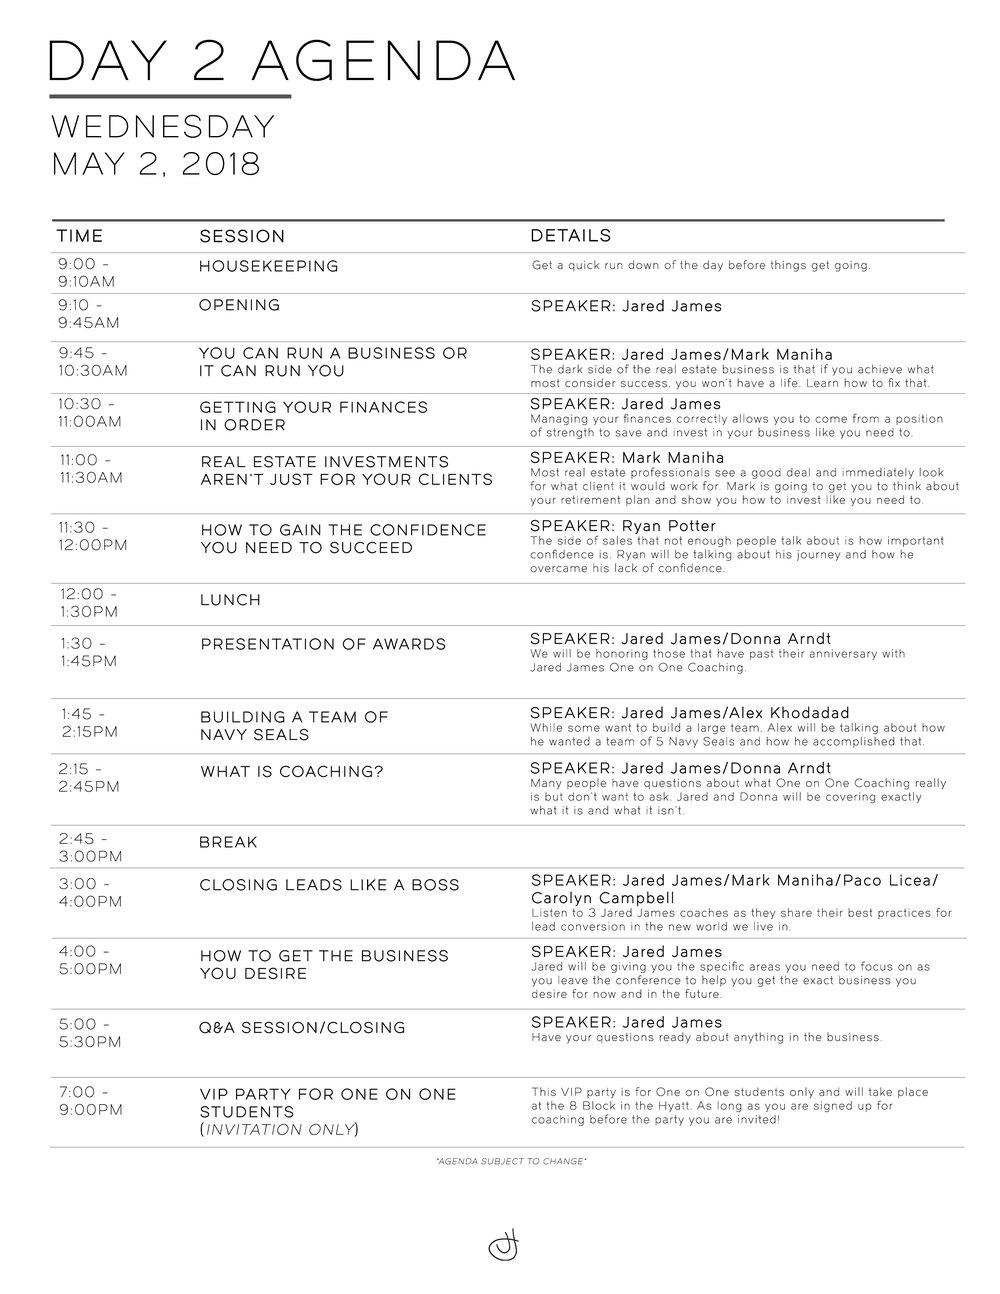 Agenda Day 2.jpg